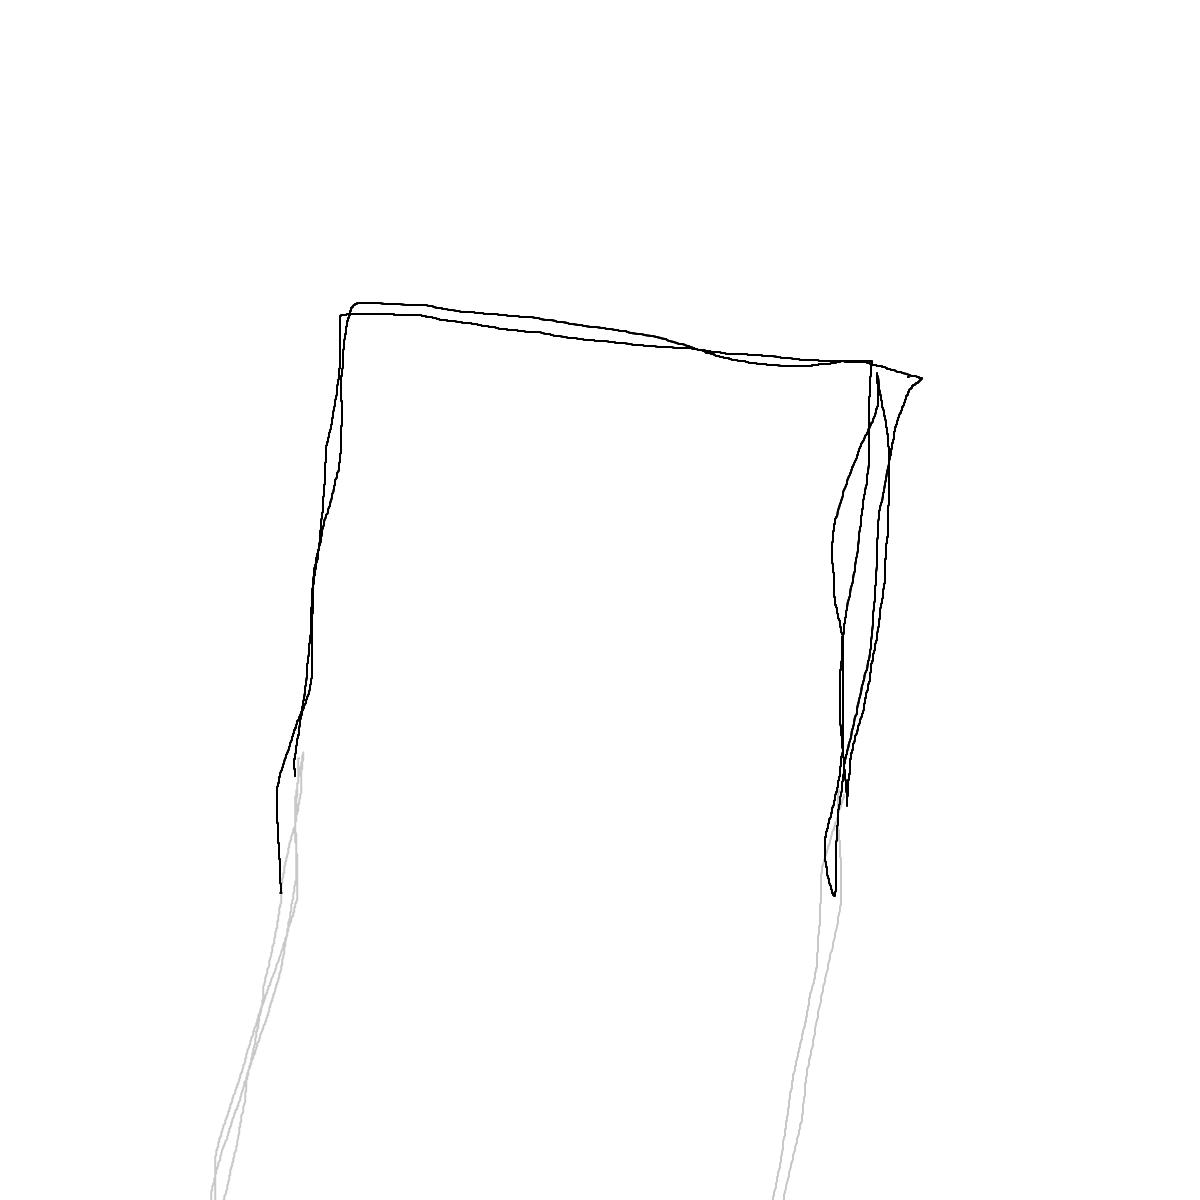 BAAAM drawing#13303 lat:38.2045745849609400lng: -85.7571105957031200